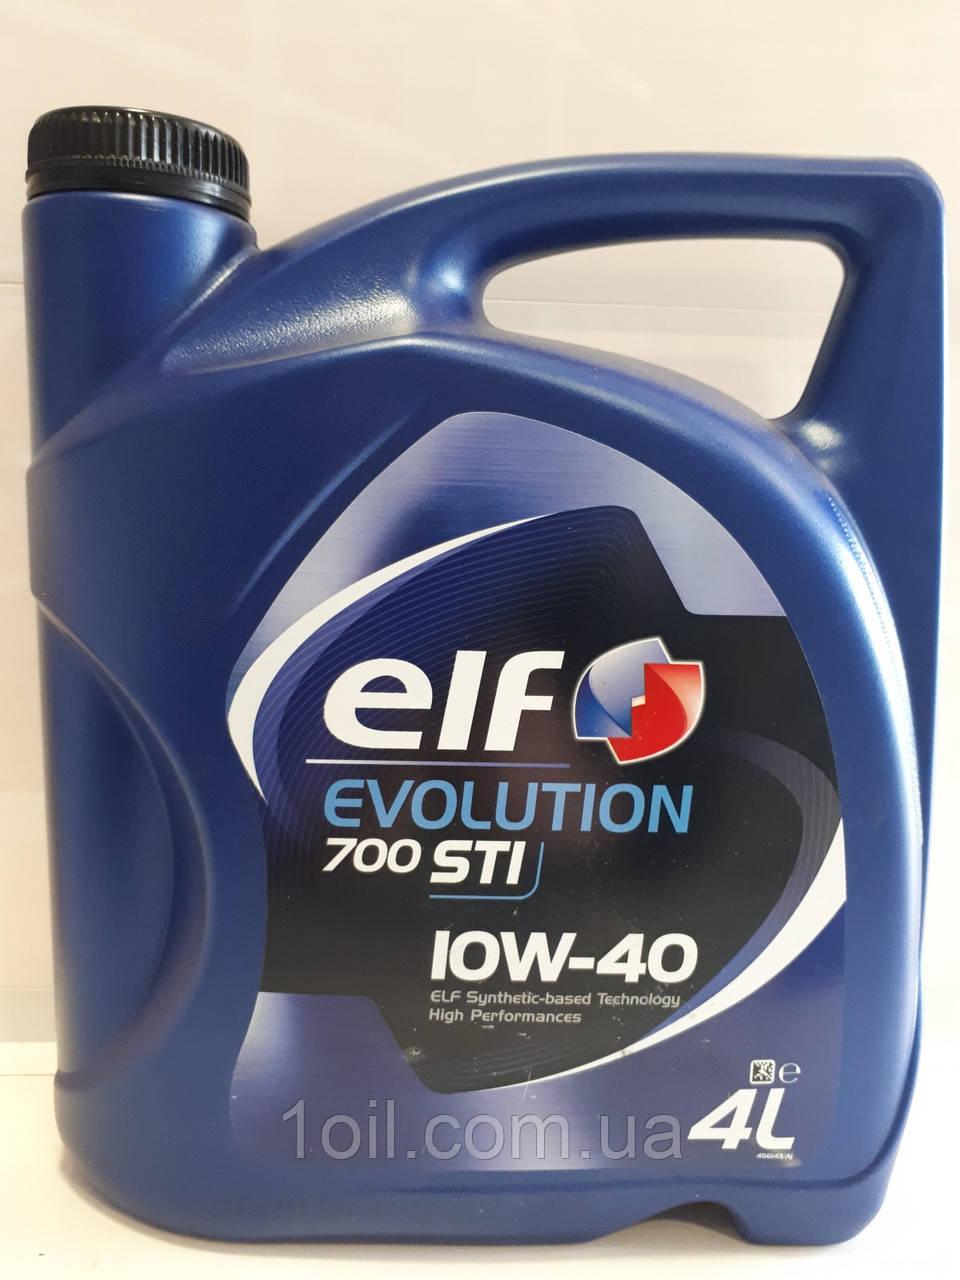 Масло моторное ELF Evolution 700 STI 10W-40 4l (по лицензии)